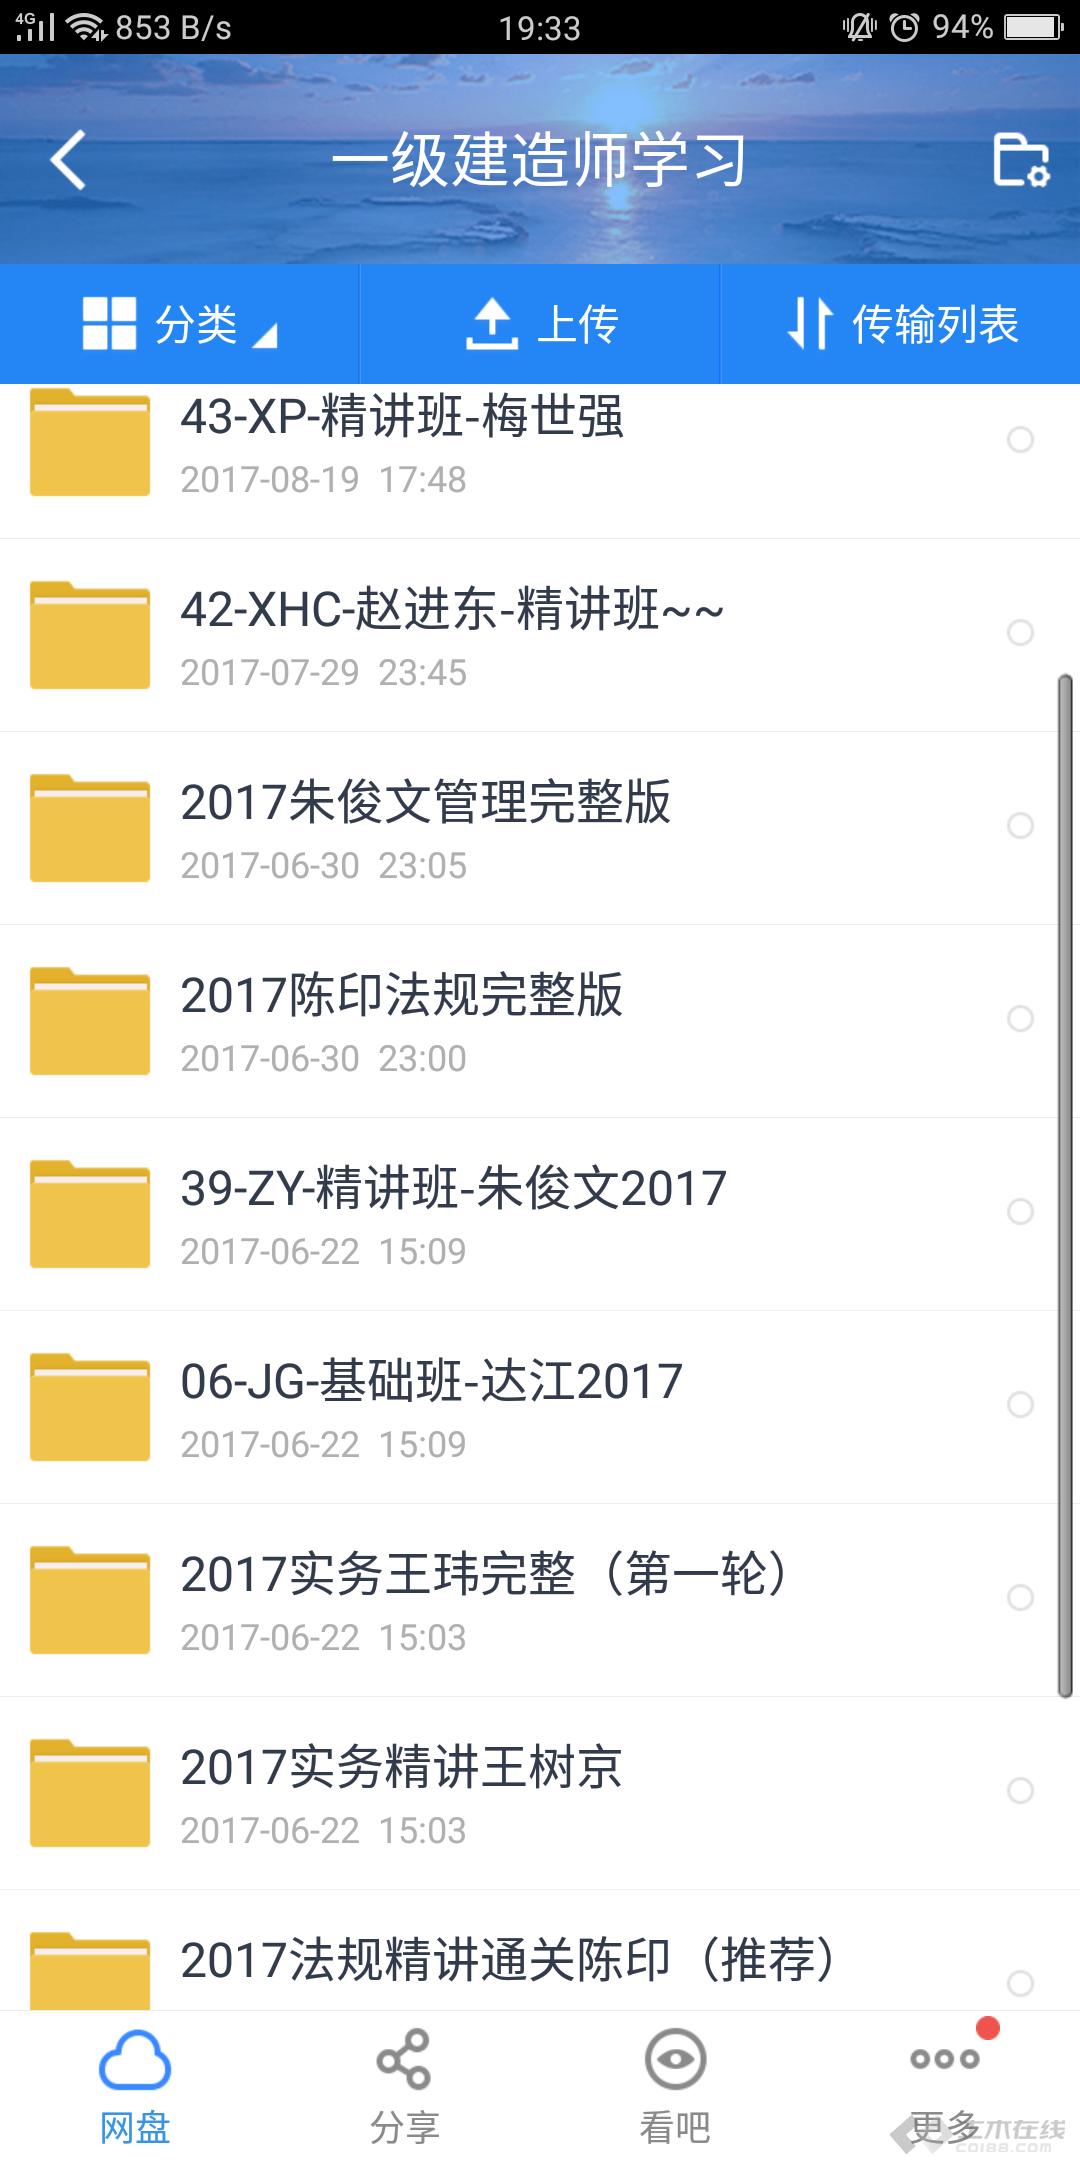 Screenshot_2018-03-05-19-33-26-53.png